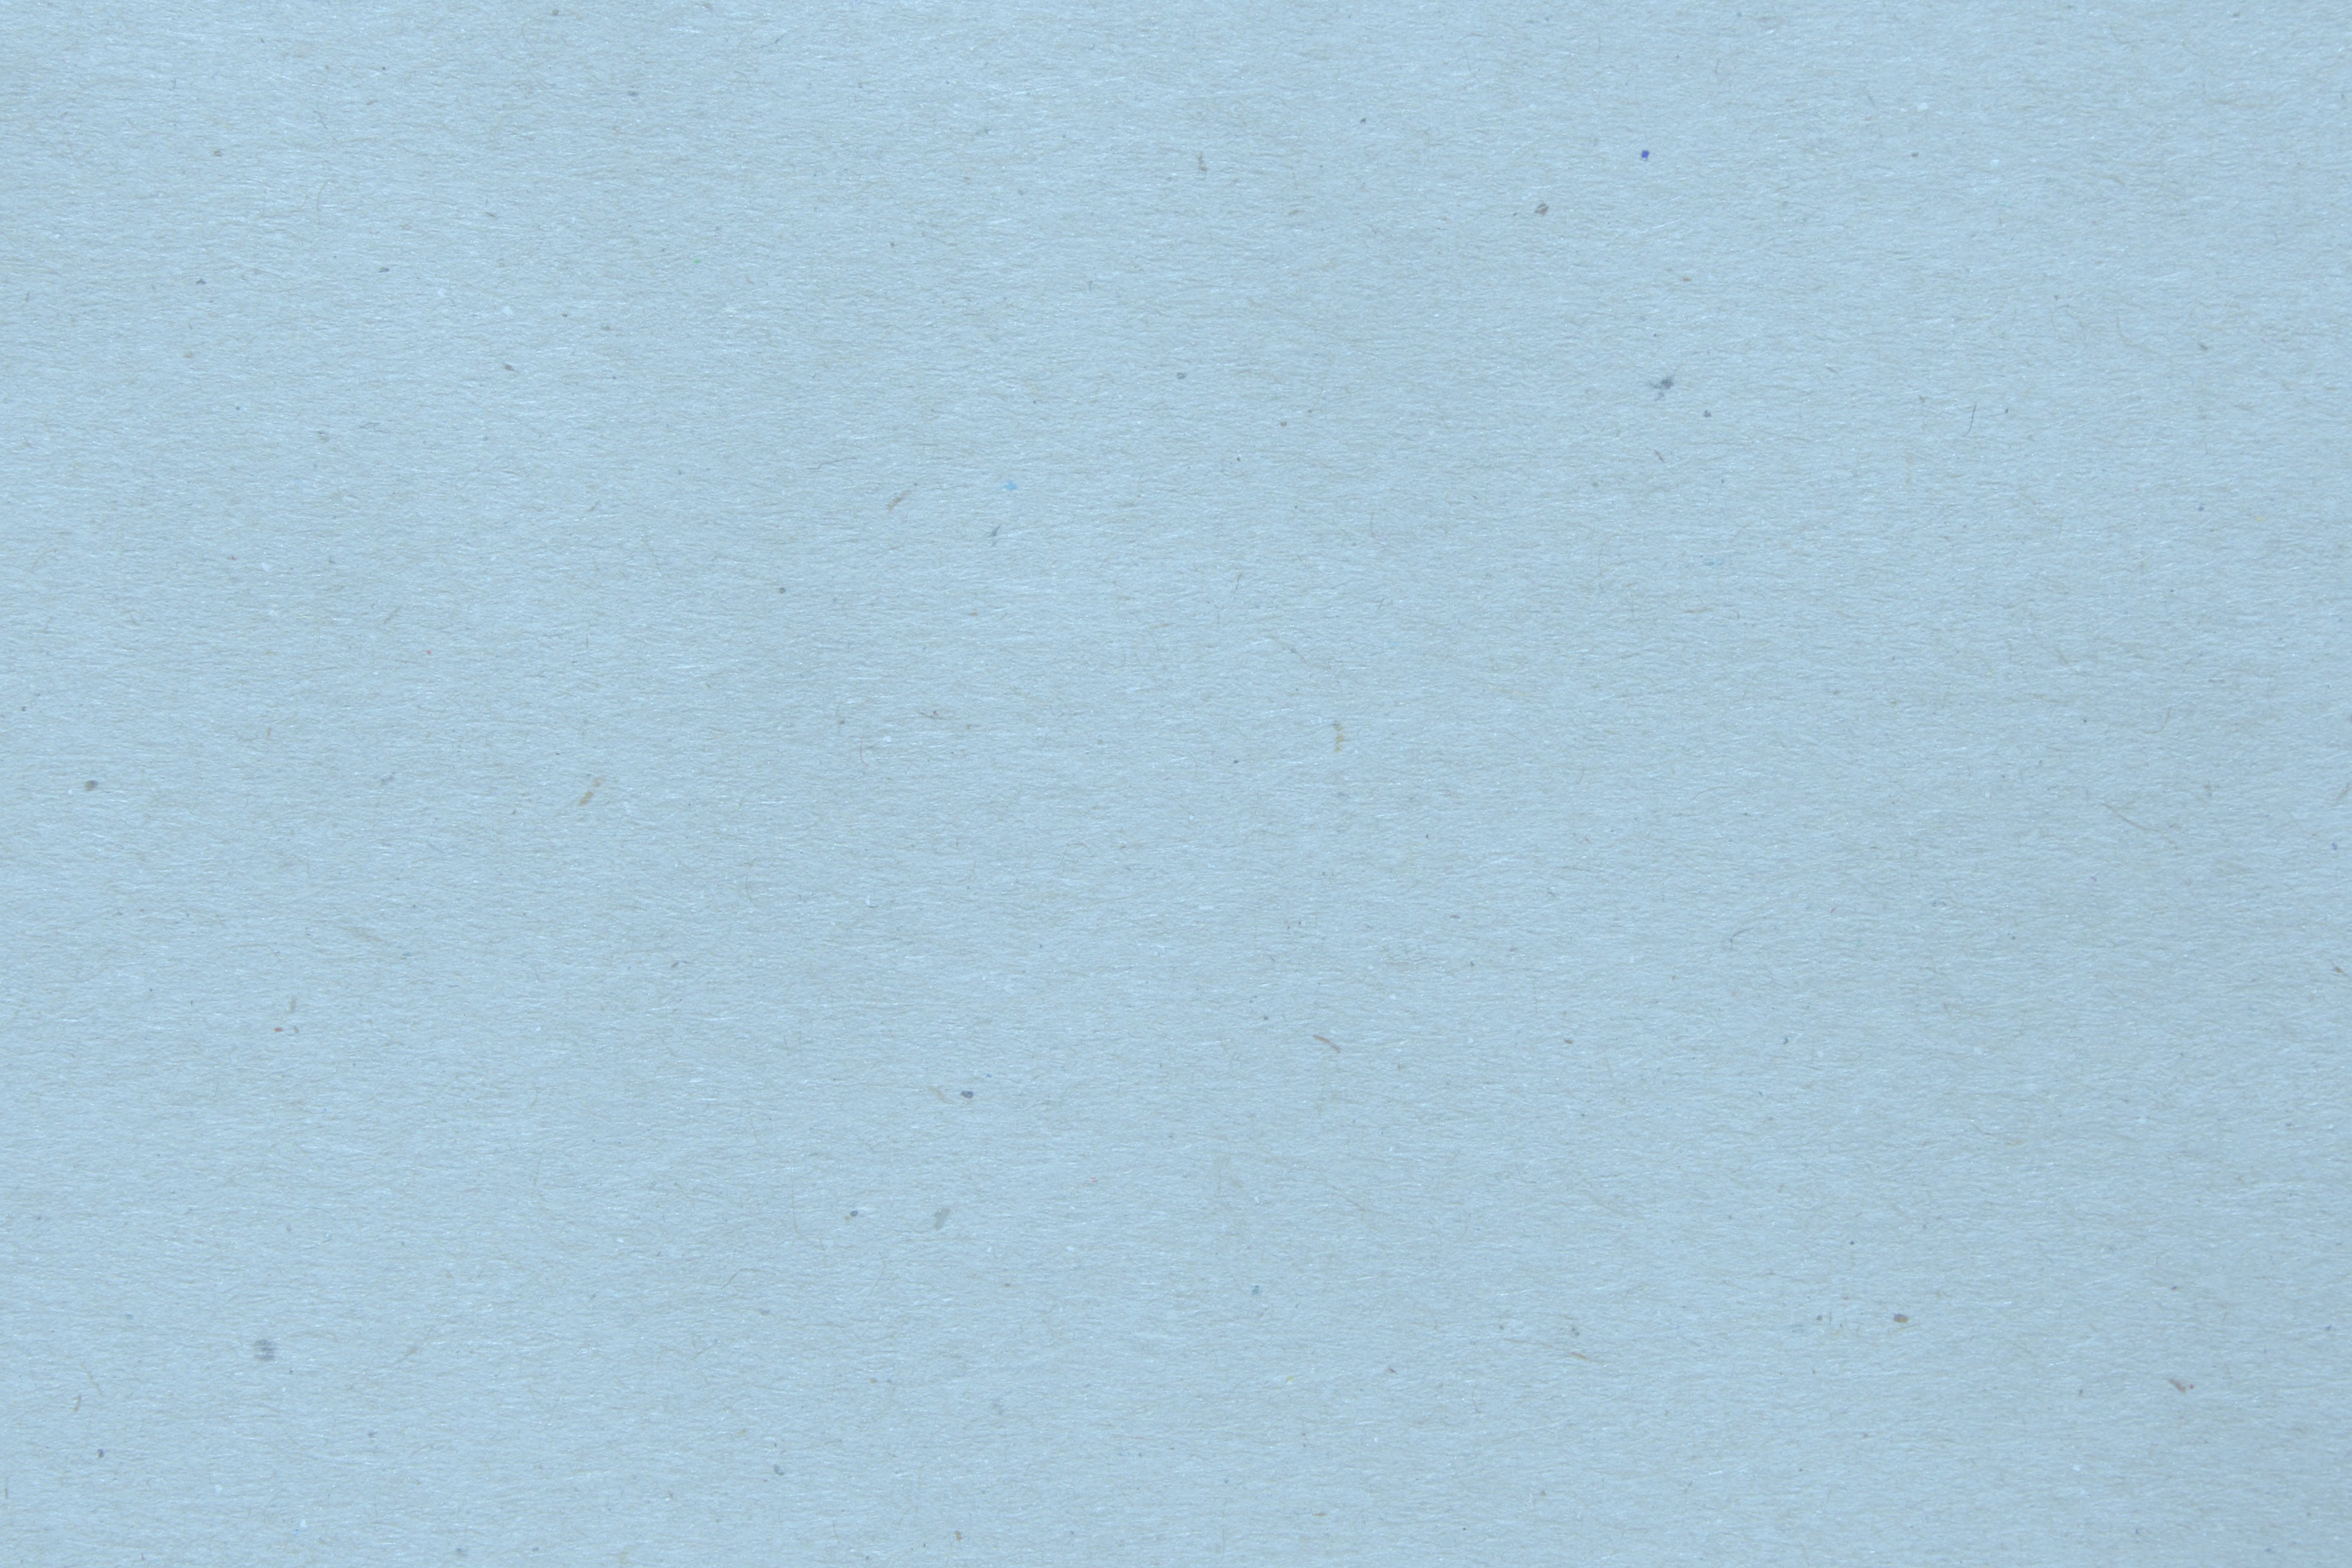 light blue leather background - photo #41